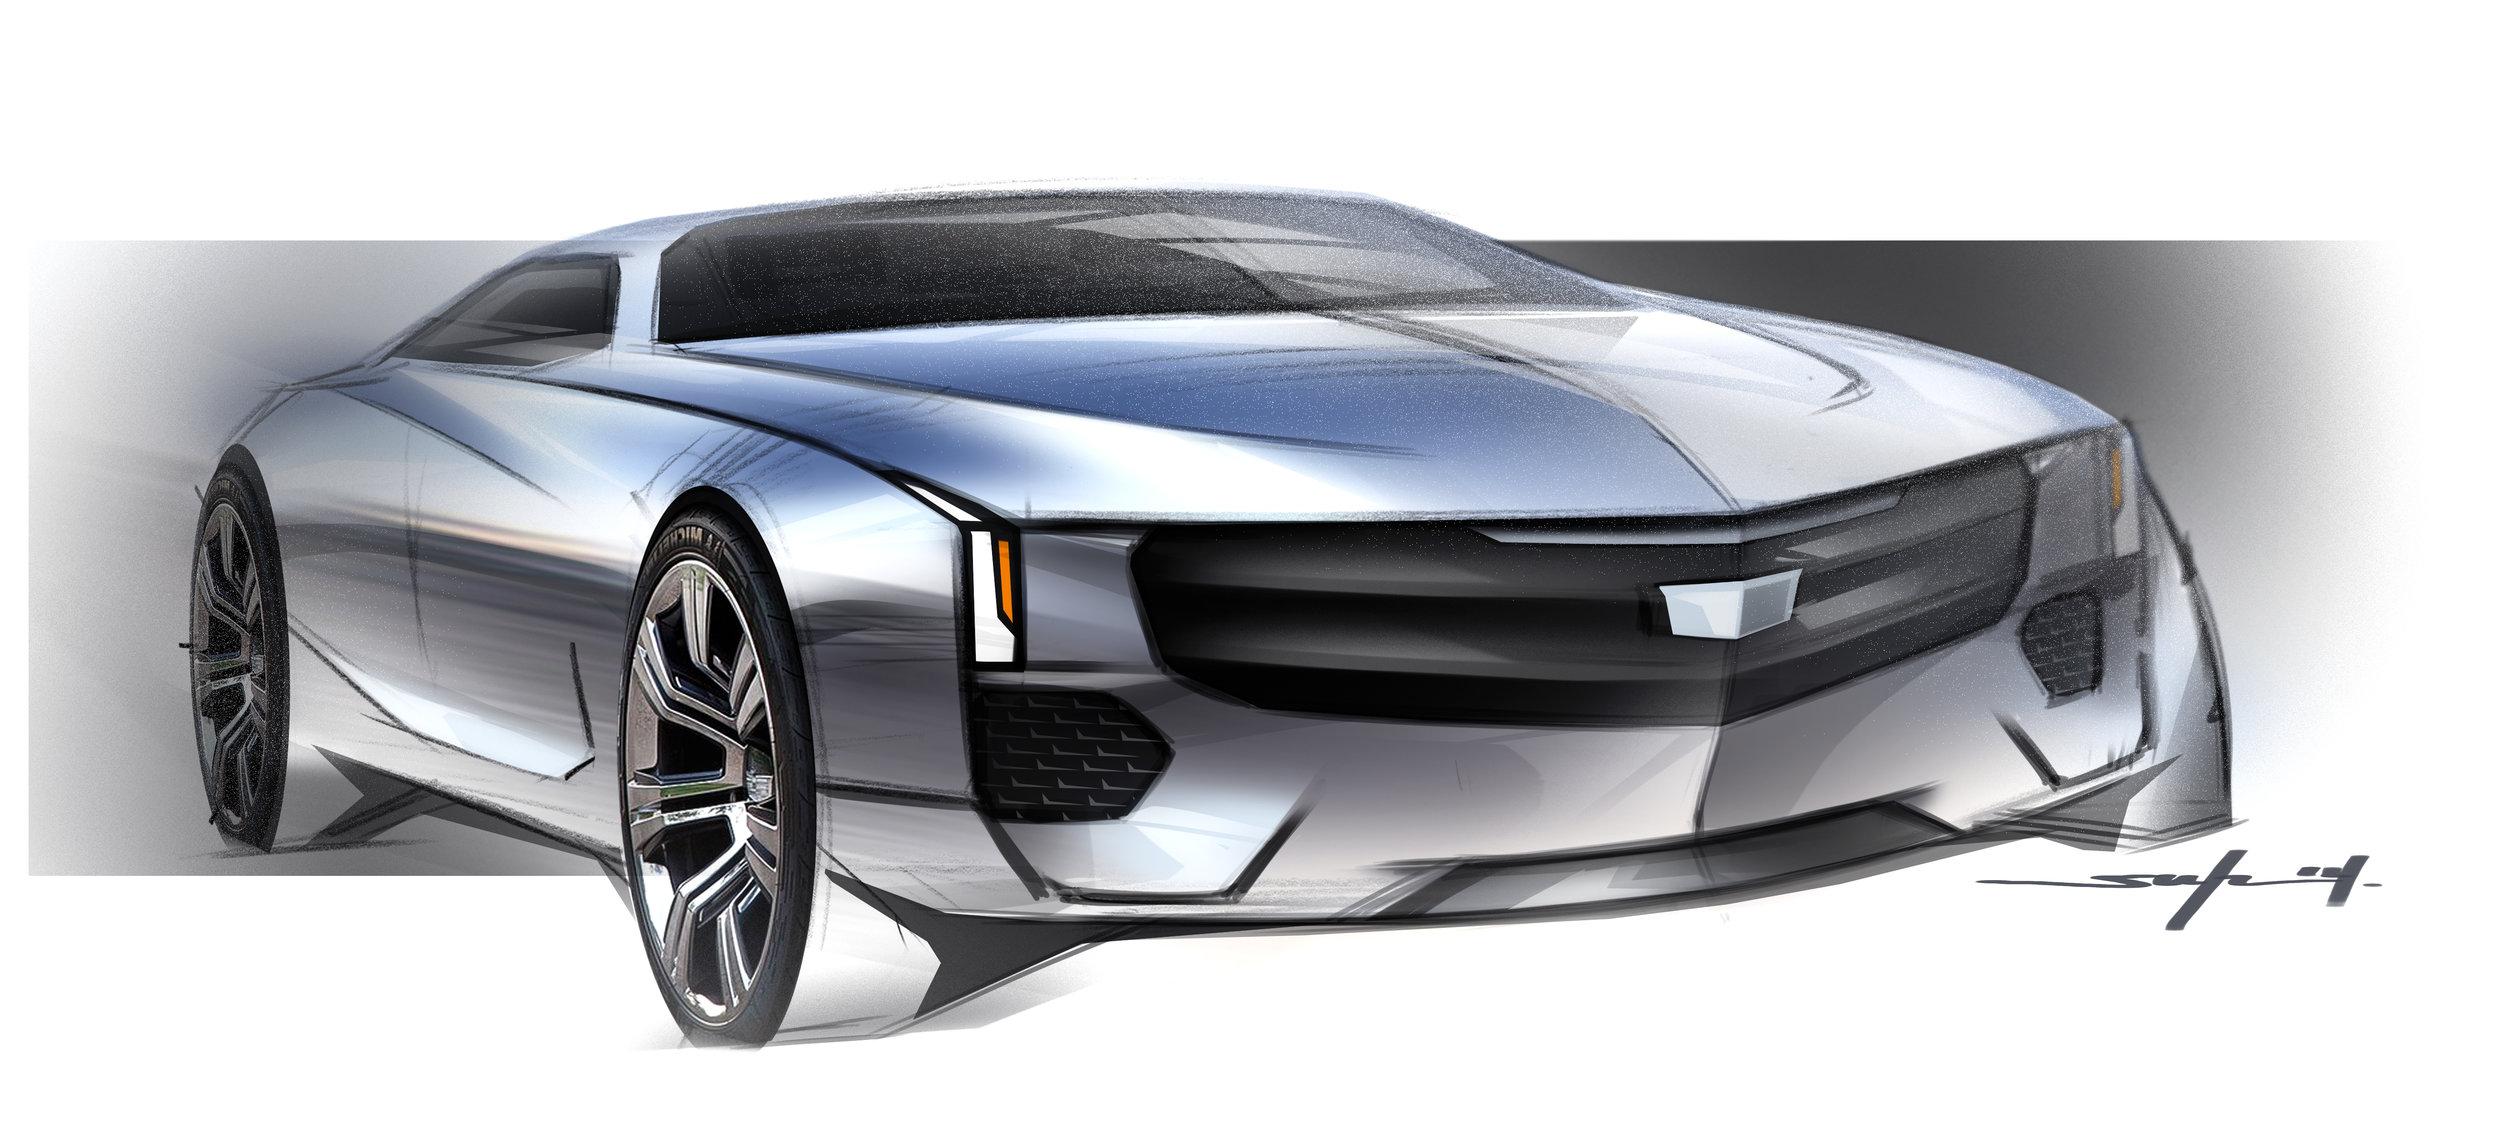 Cadillac Sedan Render 3.jpg